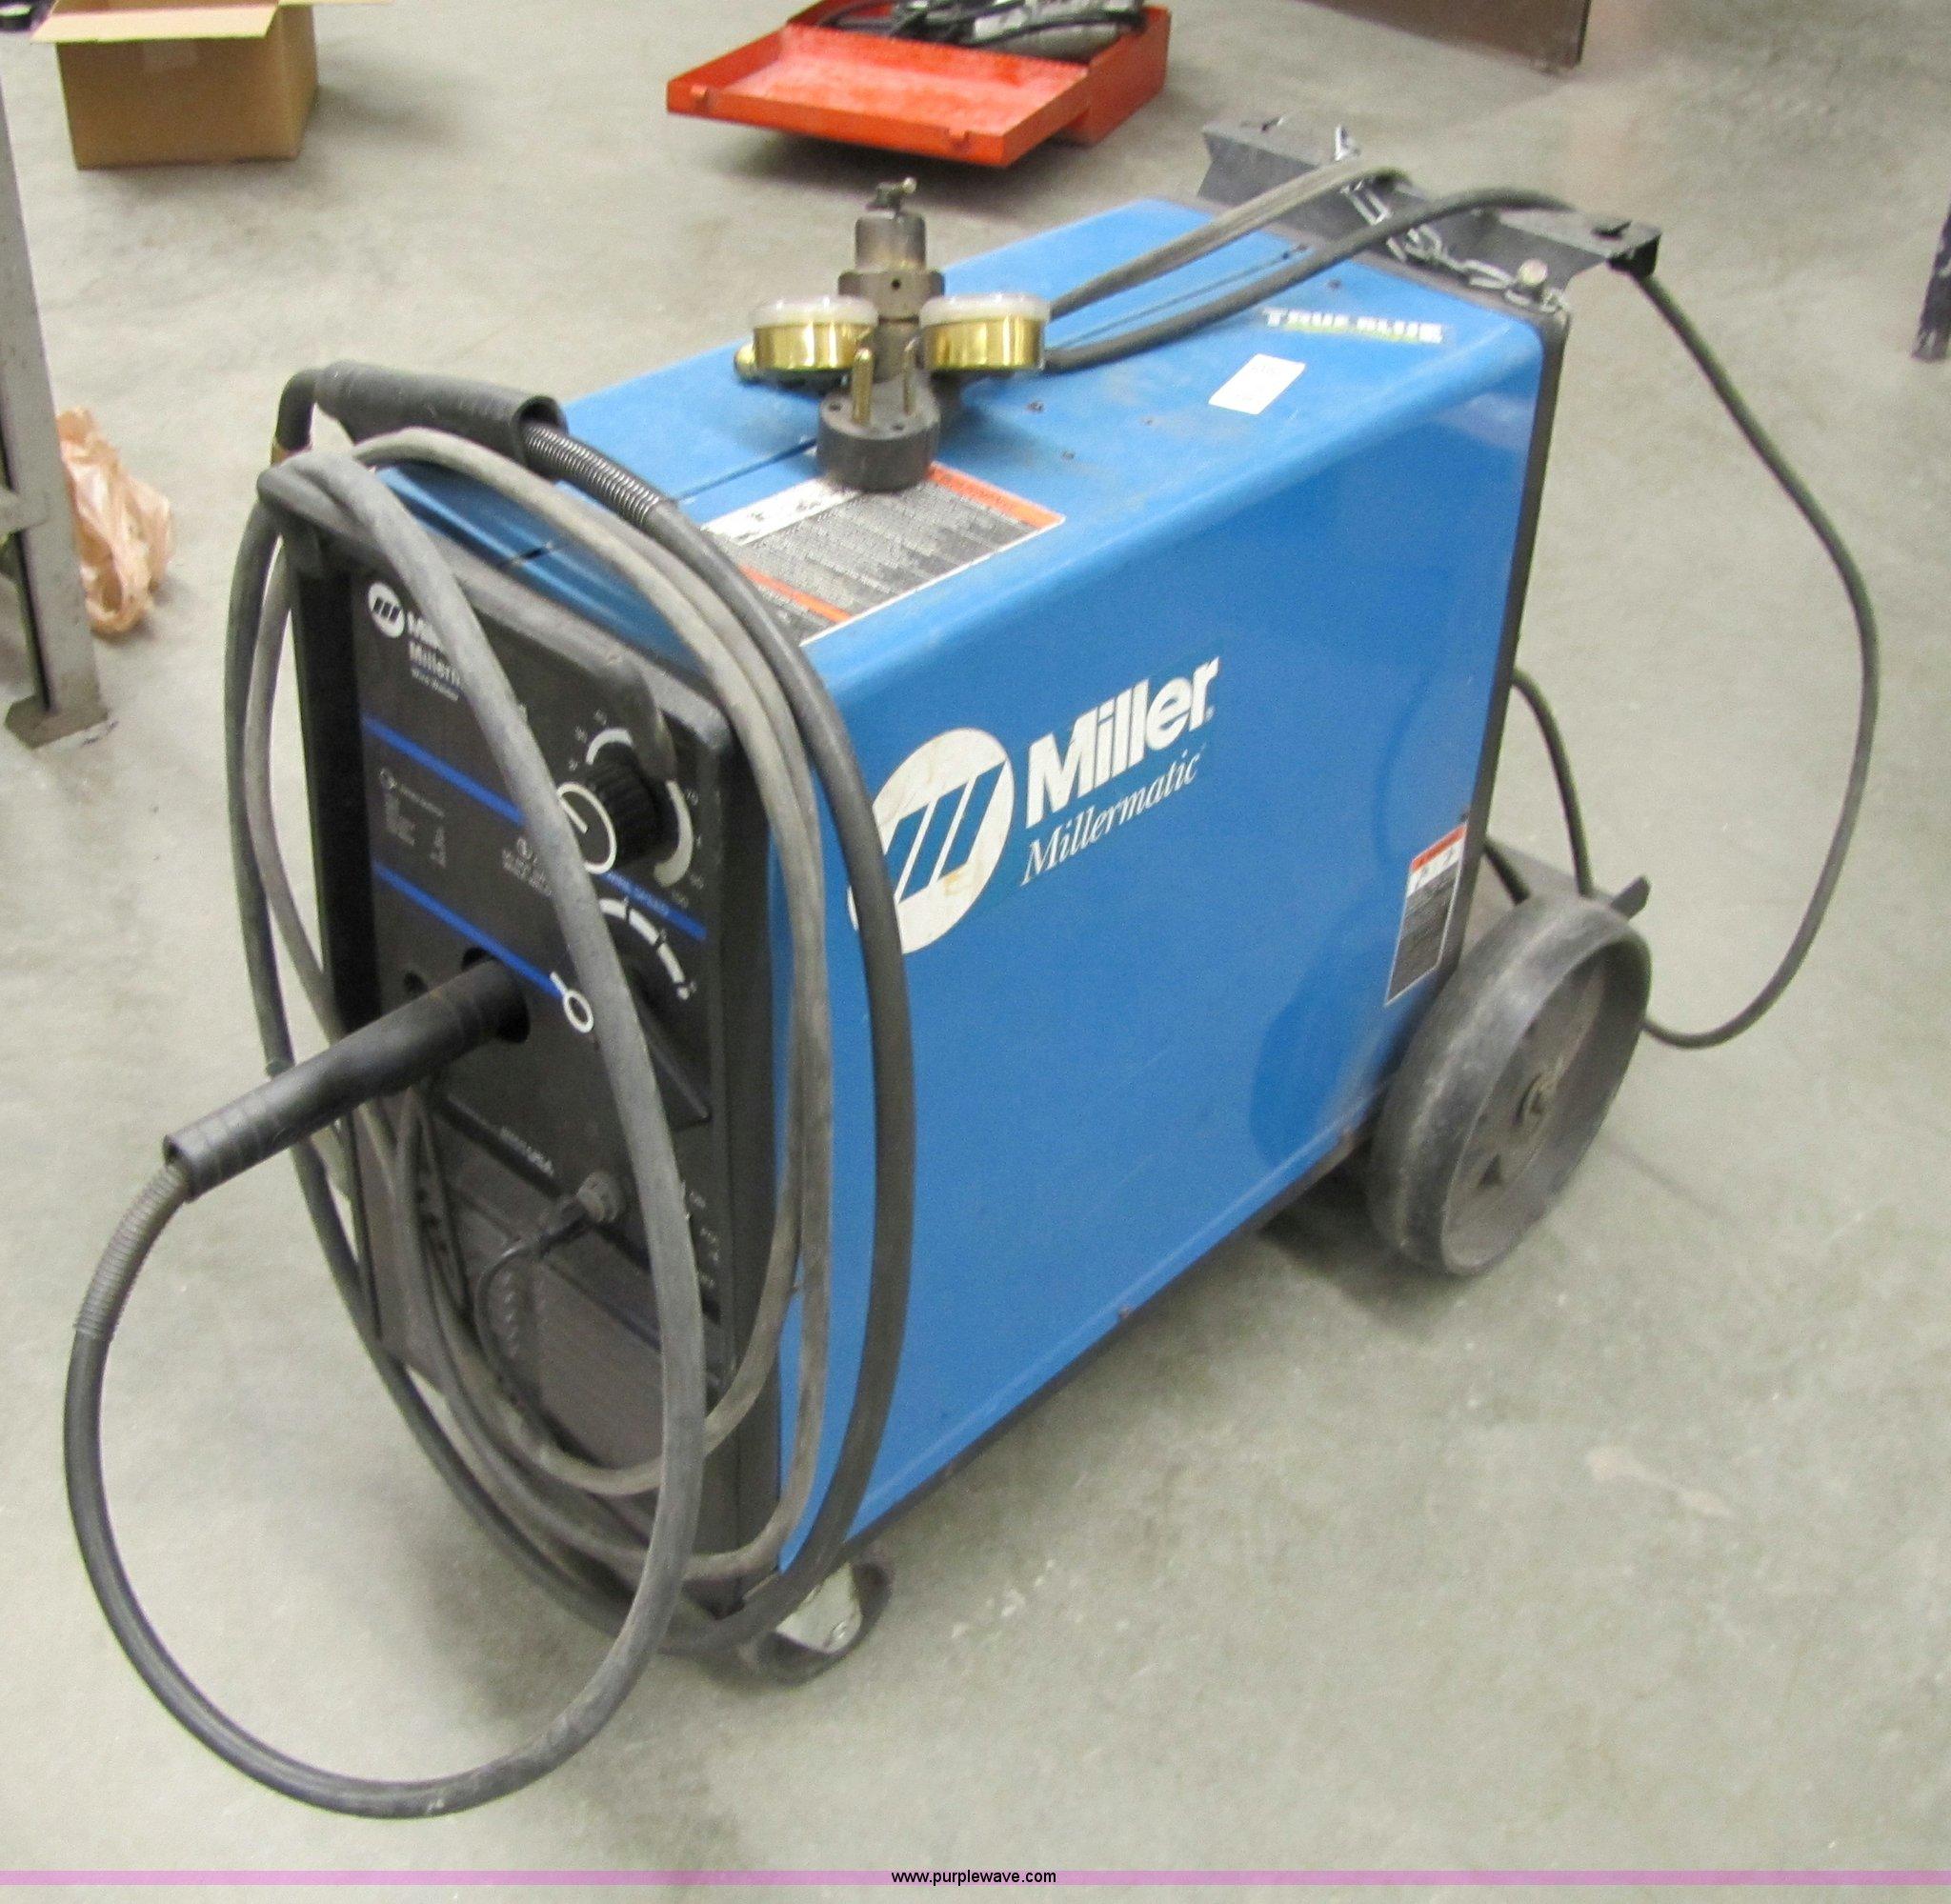 Miller Millermatic 185 wire welder | Item 9311 | SOLD! March...